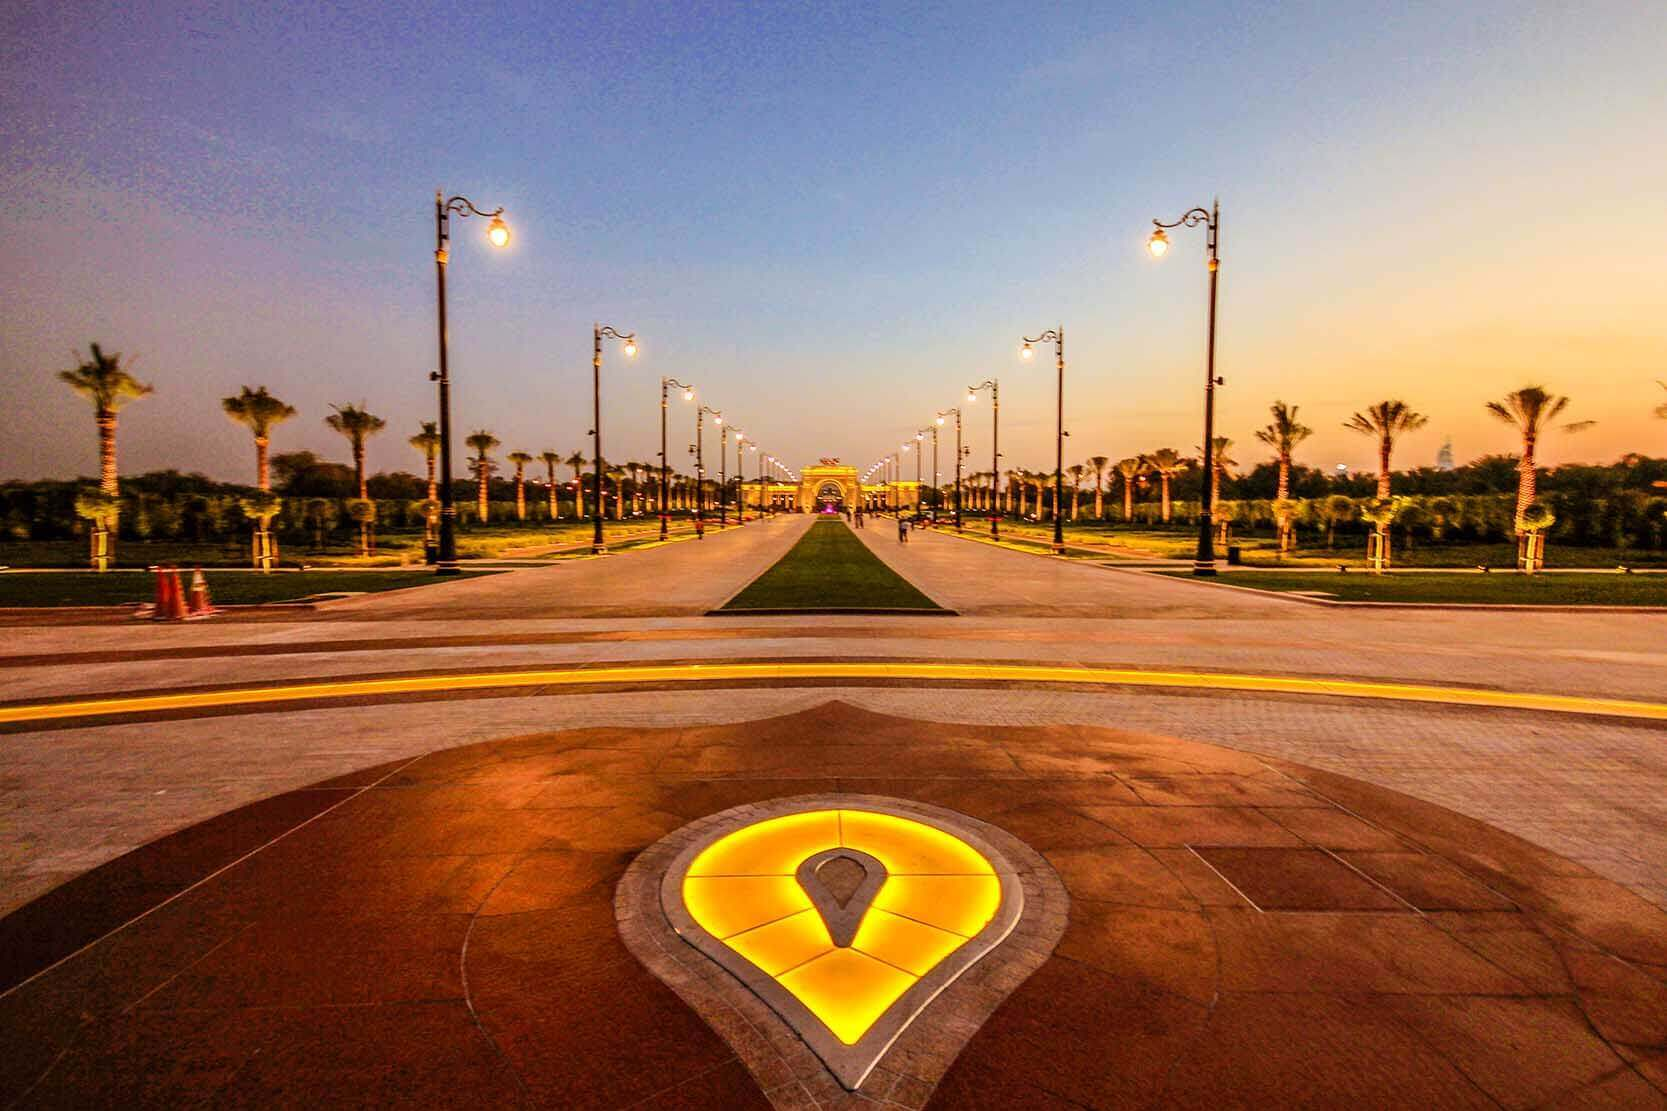 Shiek Mohammed Al Maktoum Palace Dubai - Luxuria Tours & Events